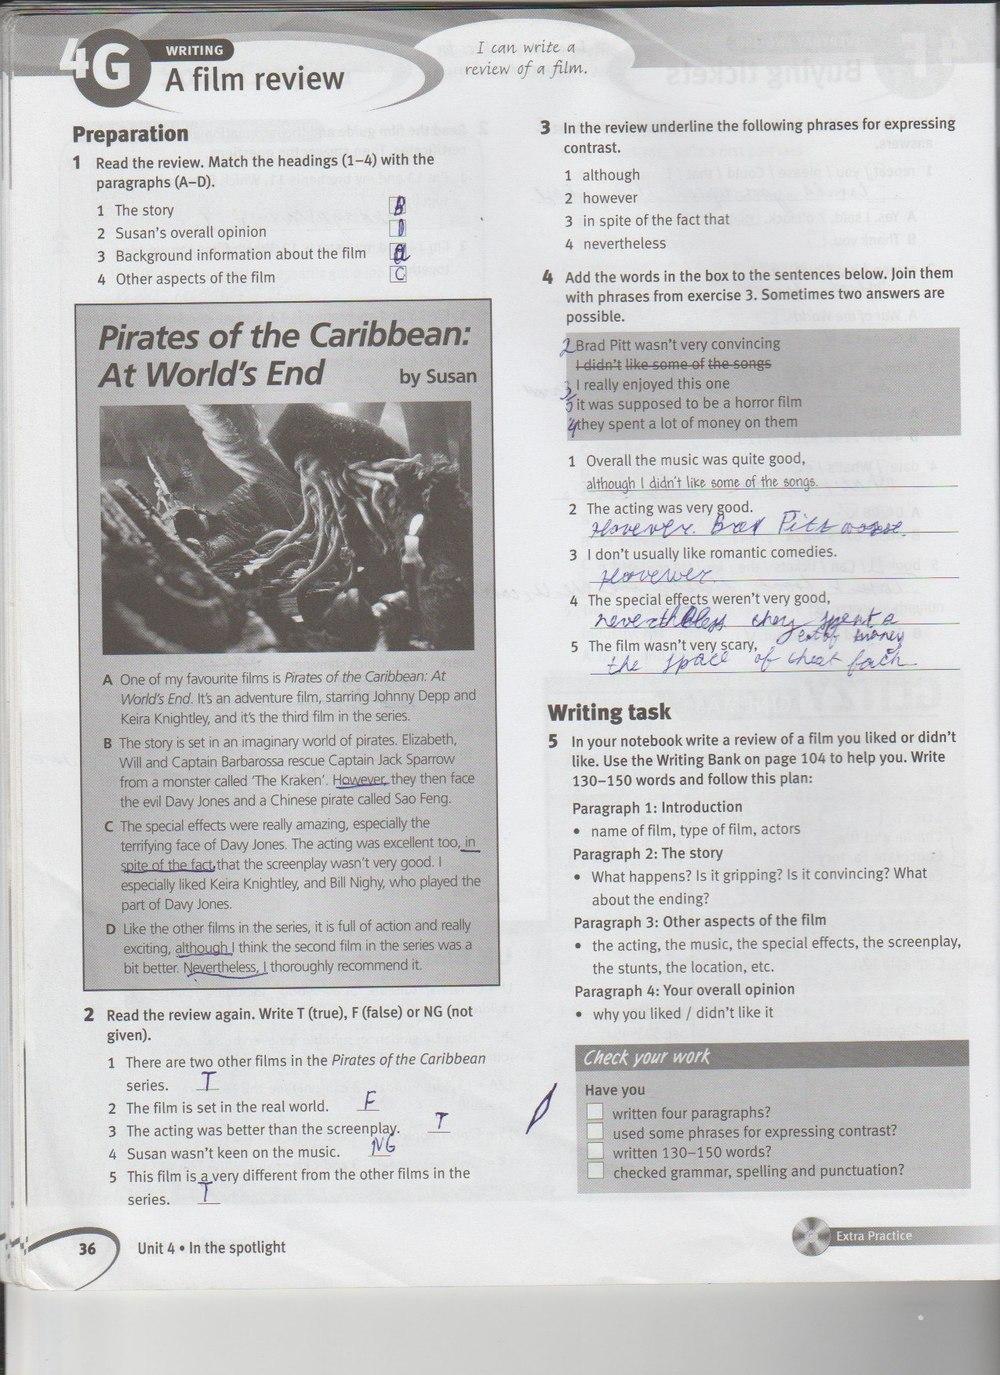 гдз английский язык 8 класс solutions pre-intermediate